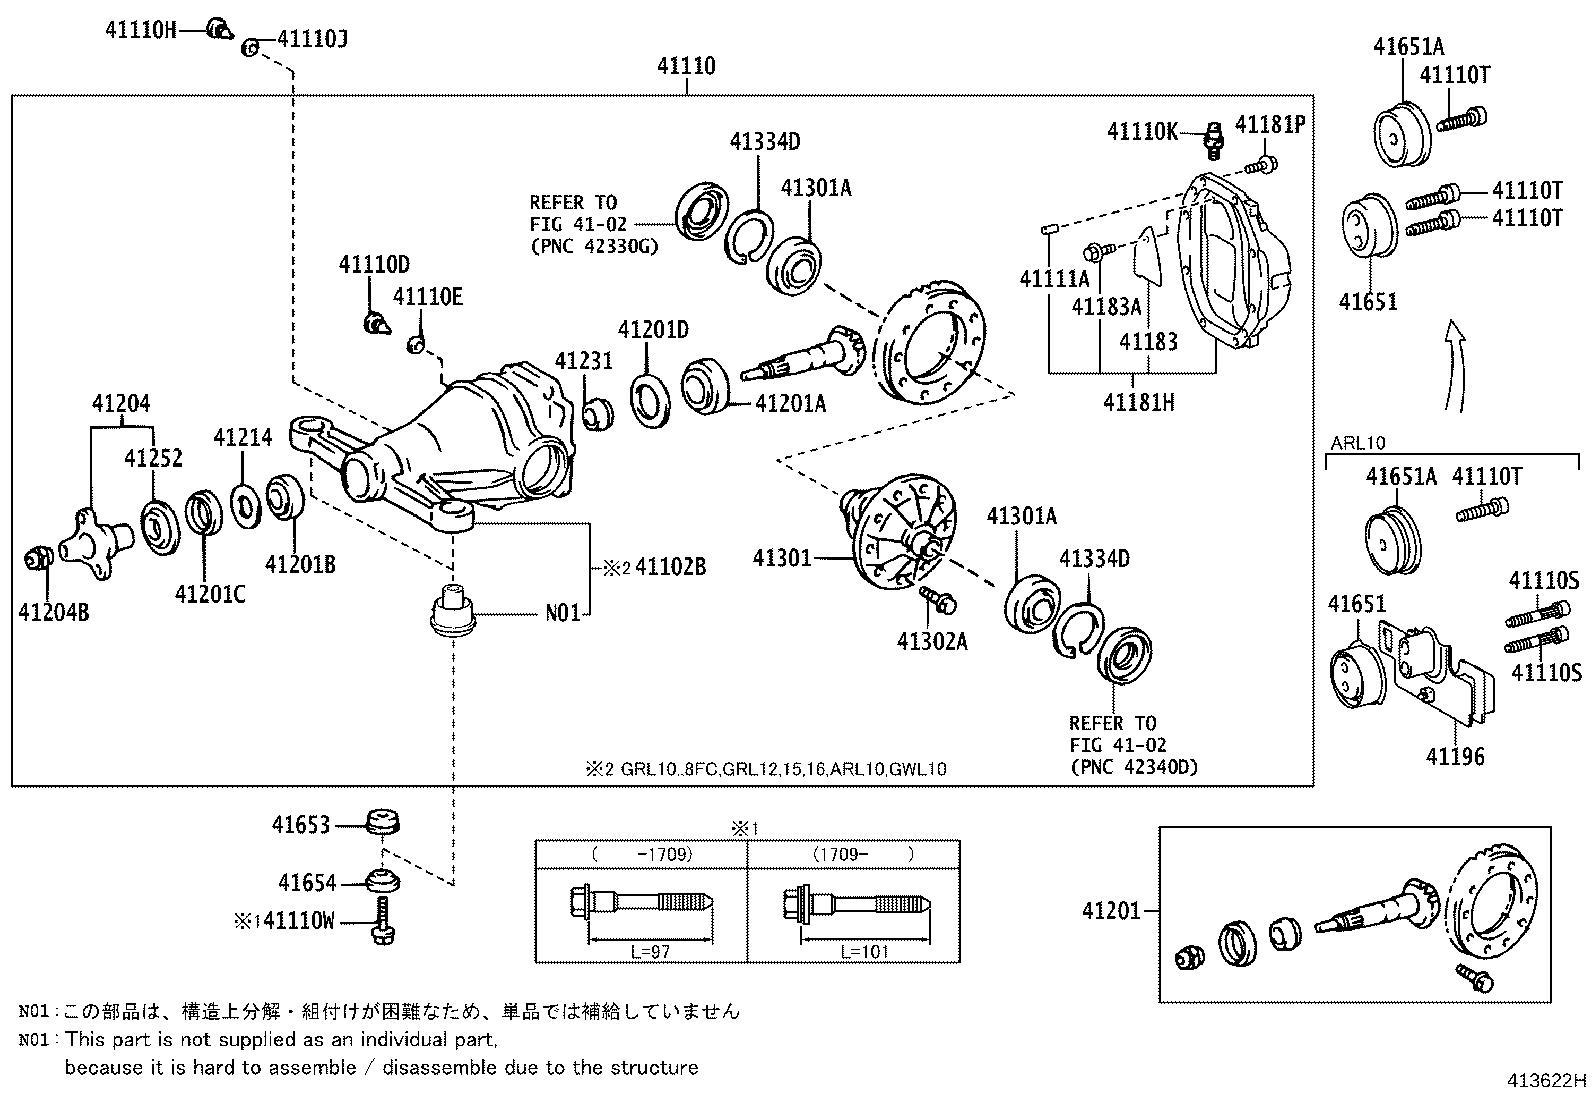 2002 Lexus LS 430 Final gear kit, differential, rear